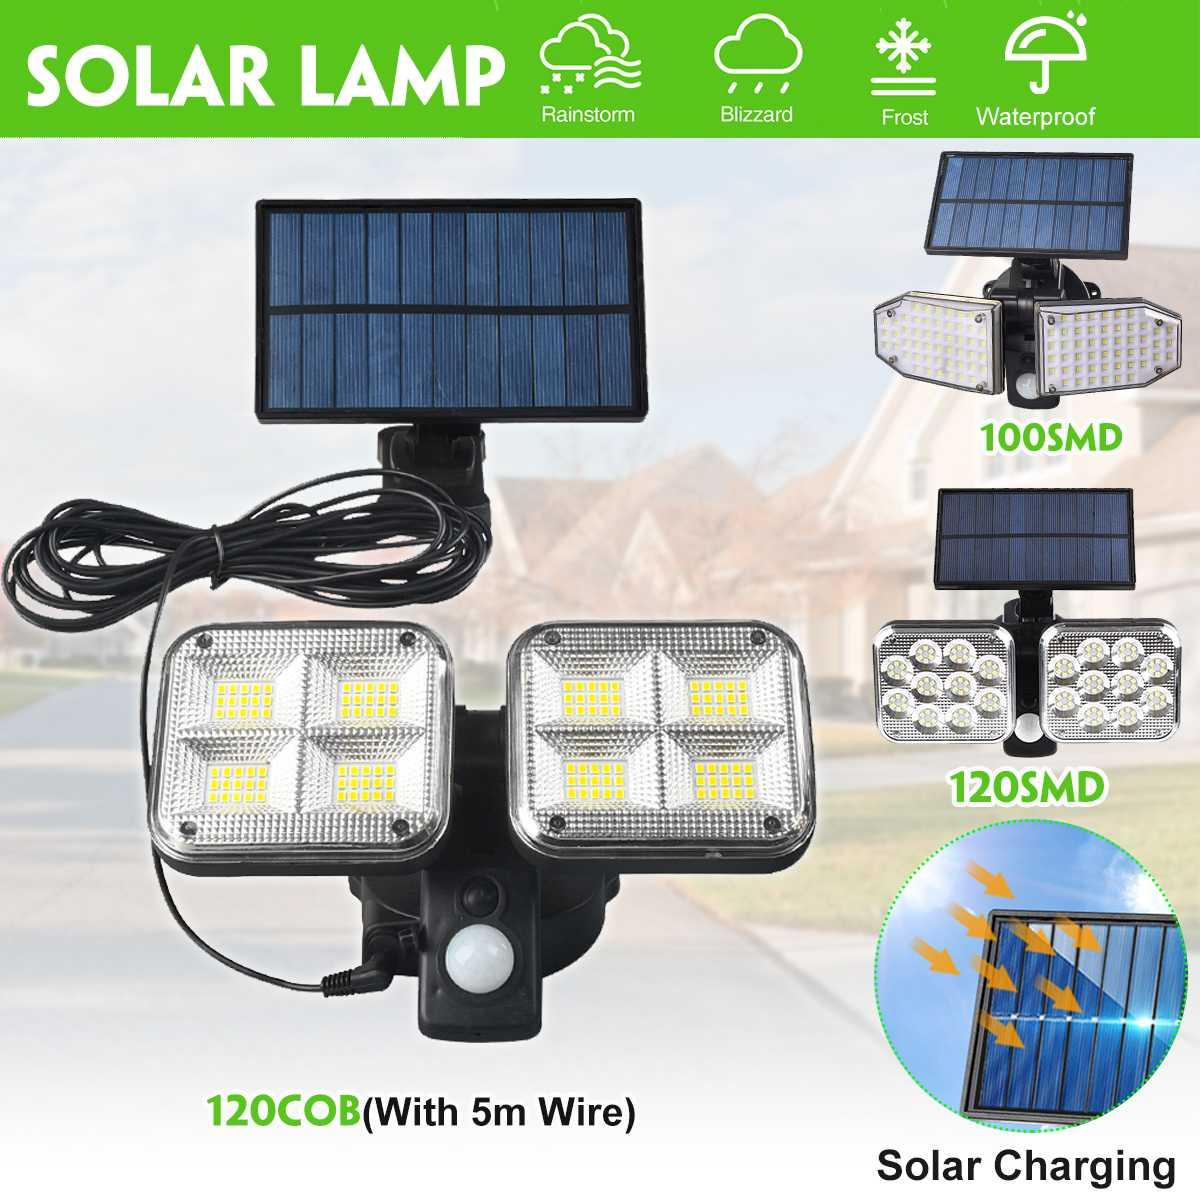 Double Head Solar Flood Light Outdoors Solar Lamp with 5m Line Outdoor Security Lighting for Home Garden Yard Street Front Door